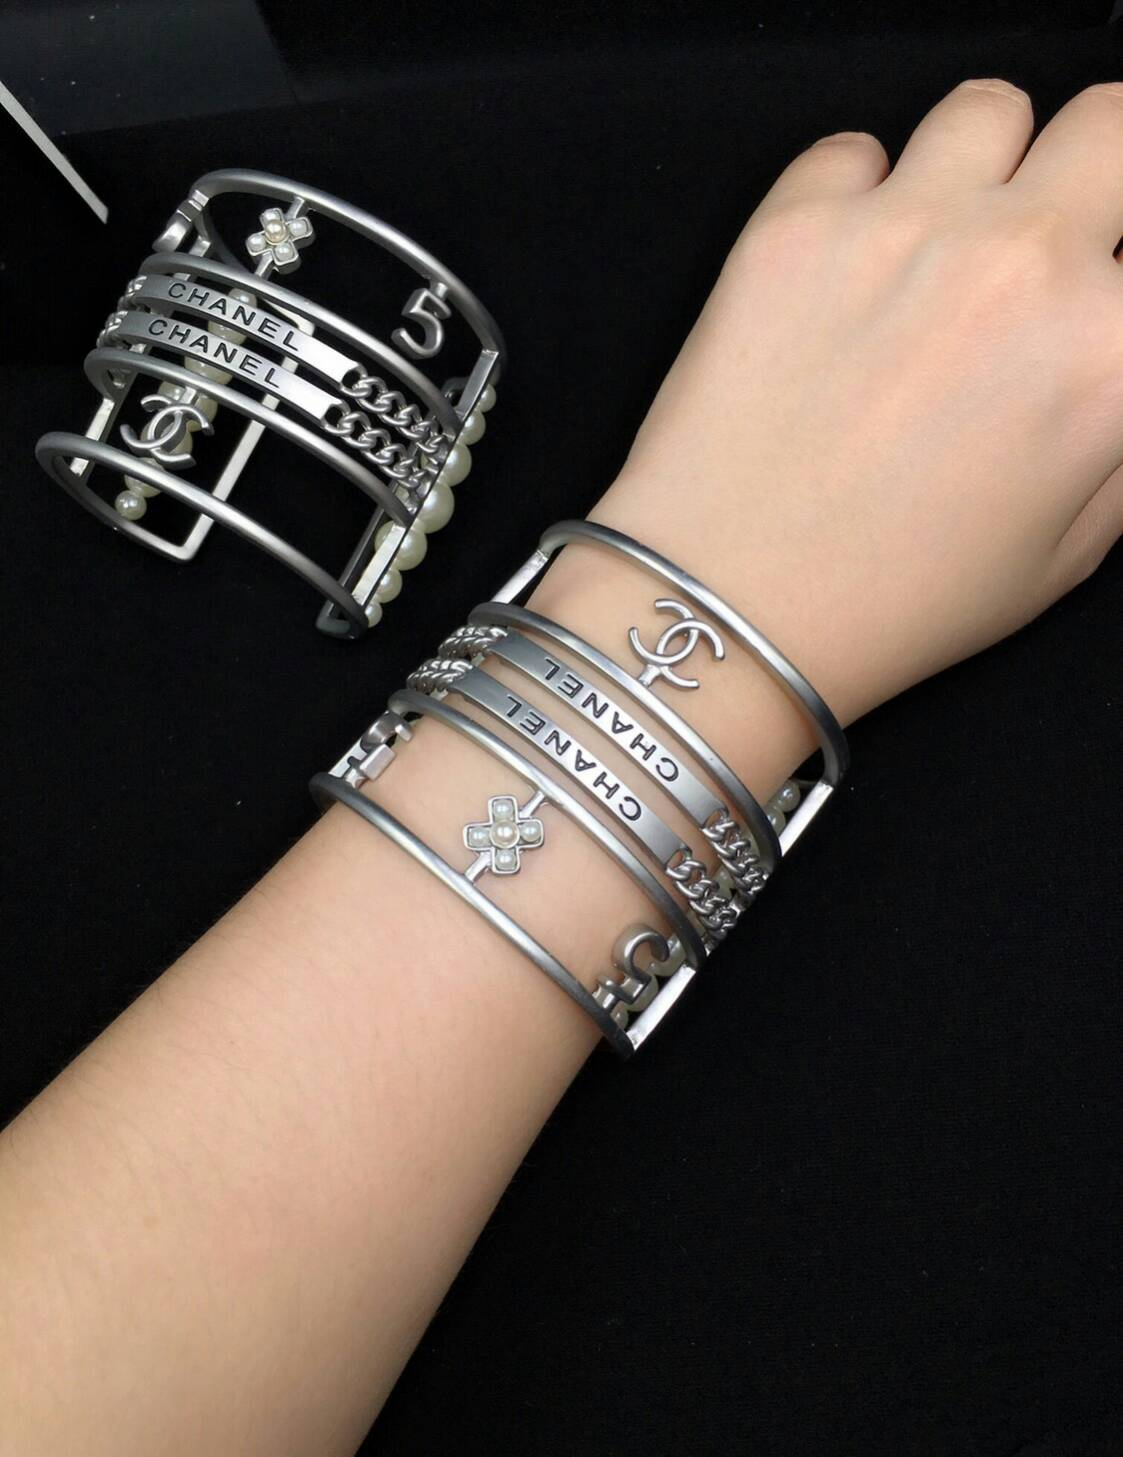 Chanel Bracelet งานซุปเปอร์ไฮเอน สวยเหมือนทุกจุด ตัวเรือนหนาแข็งแรง สีเงินด้านสวยคลาสสิค